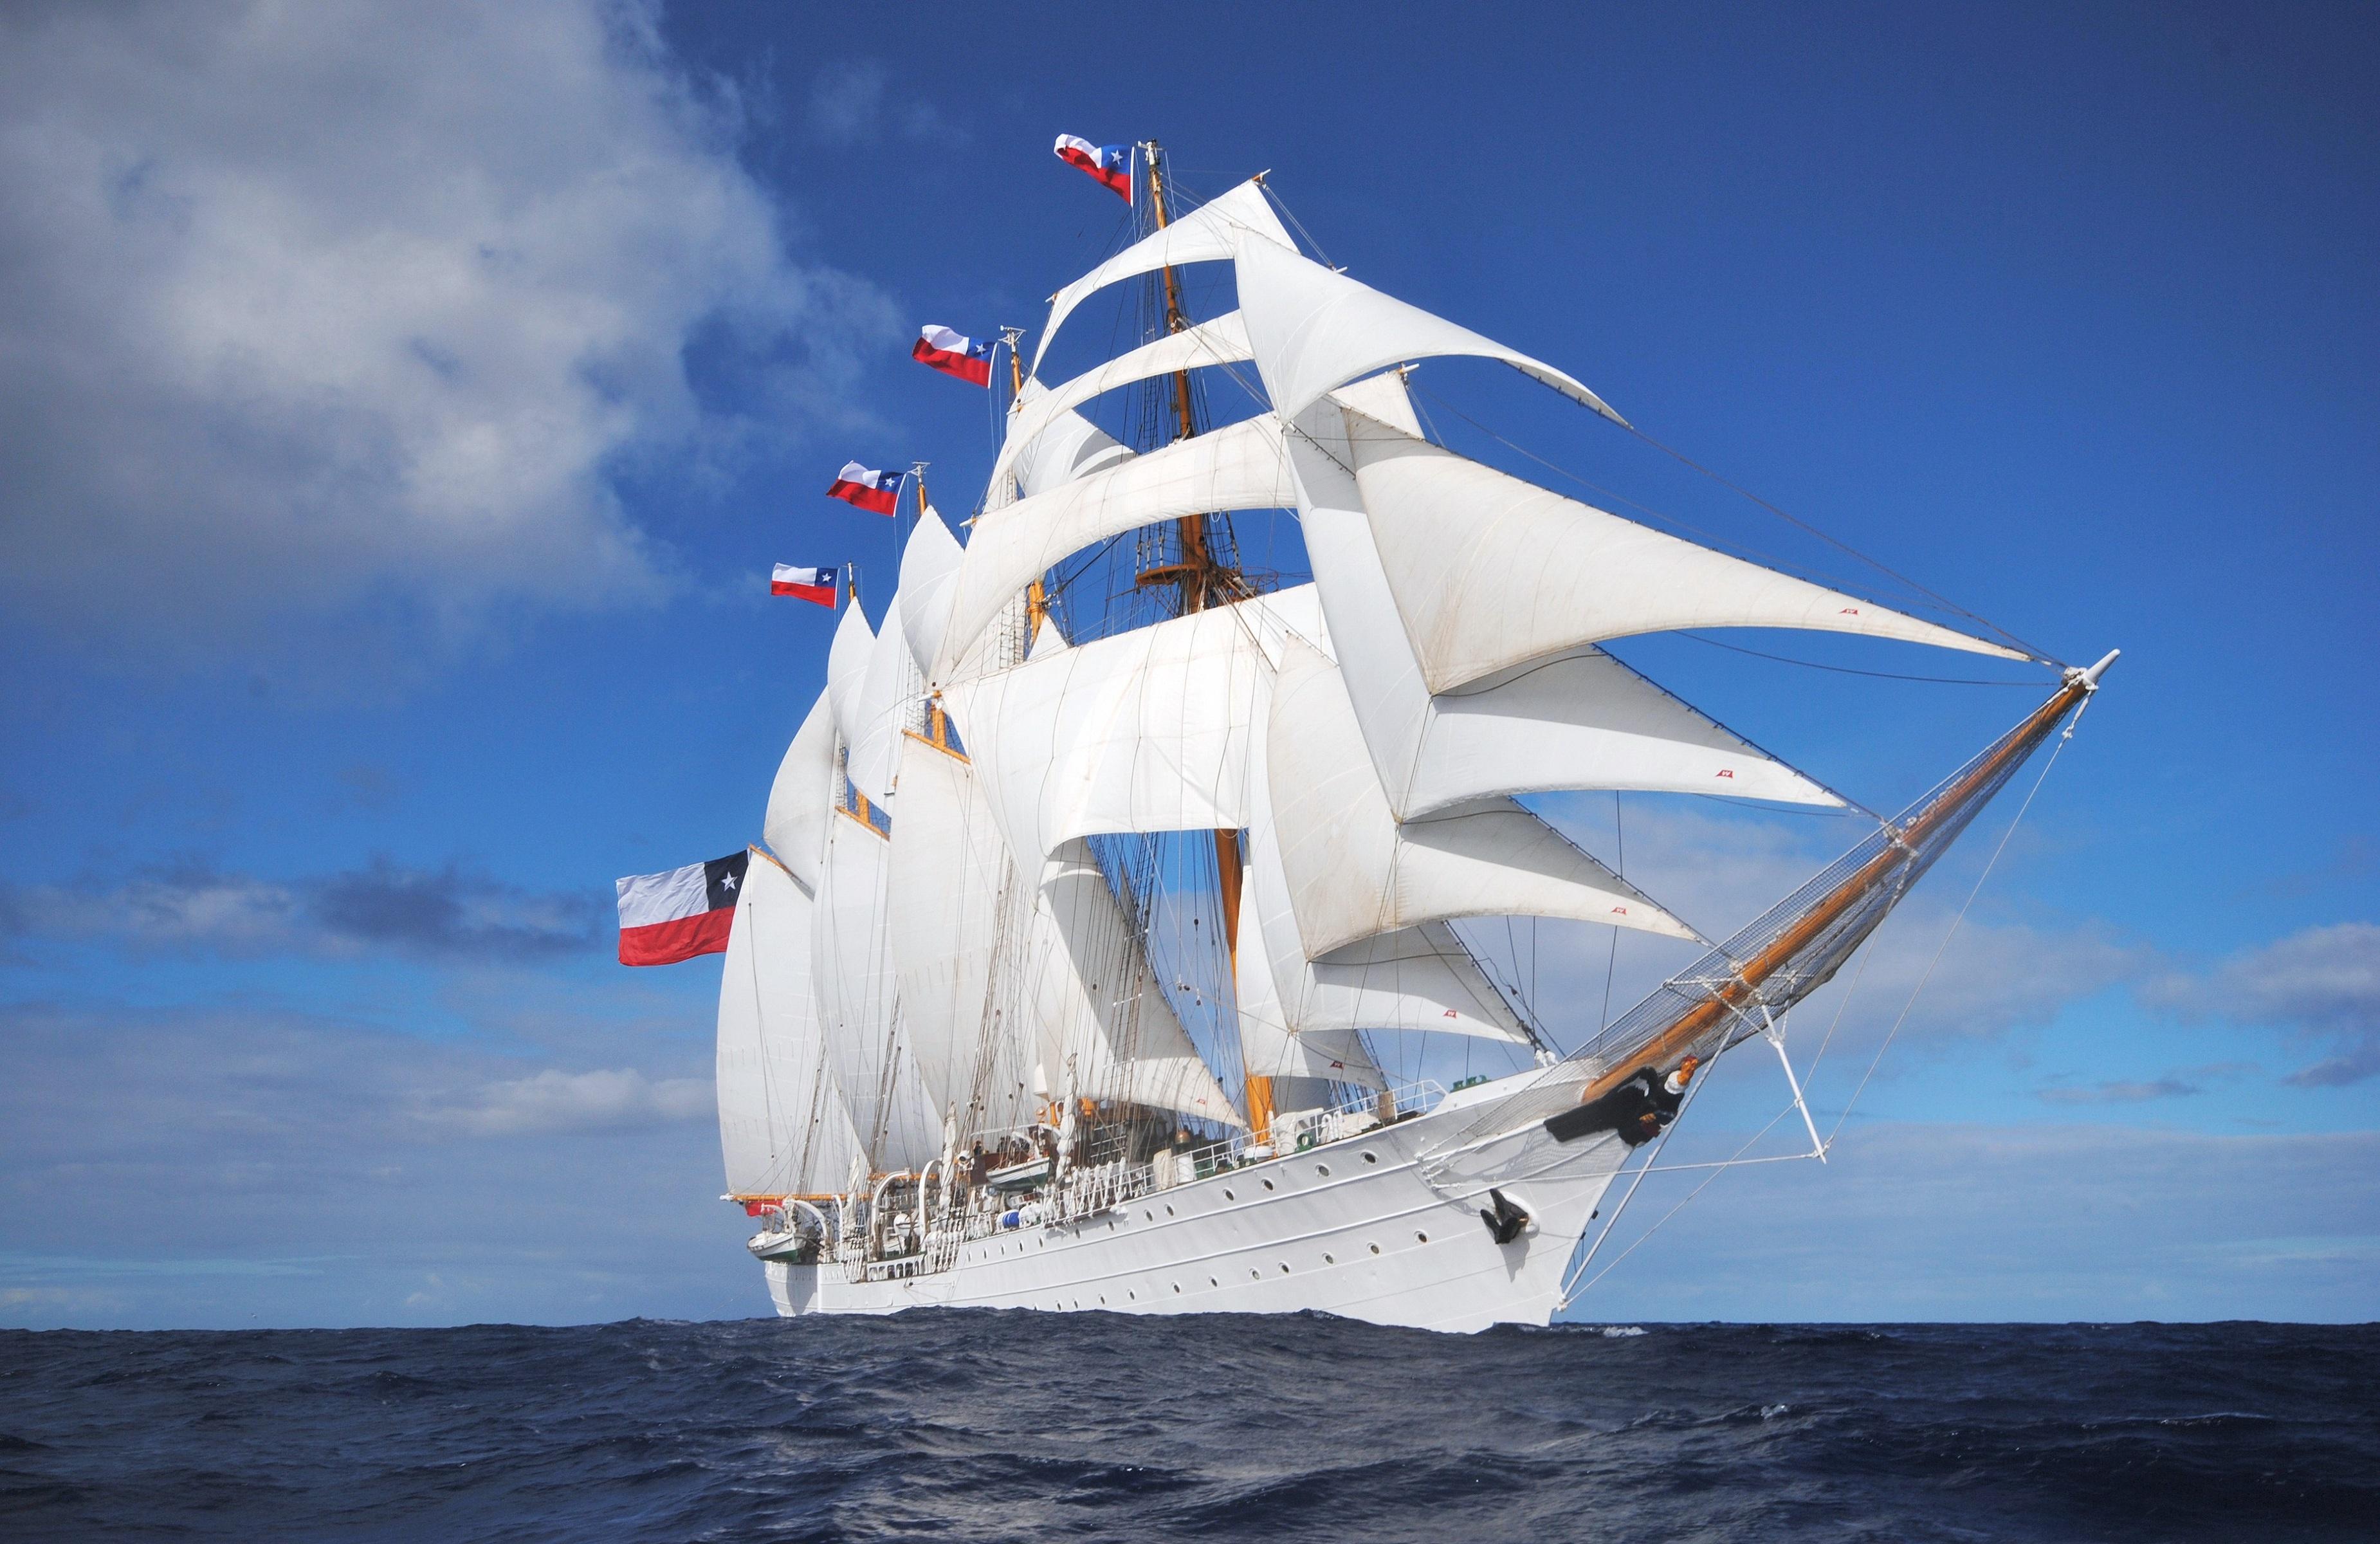 Barco chileno - 3700x2400